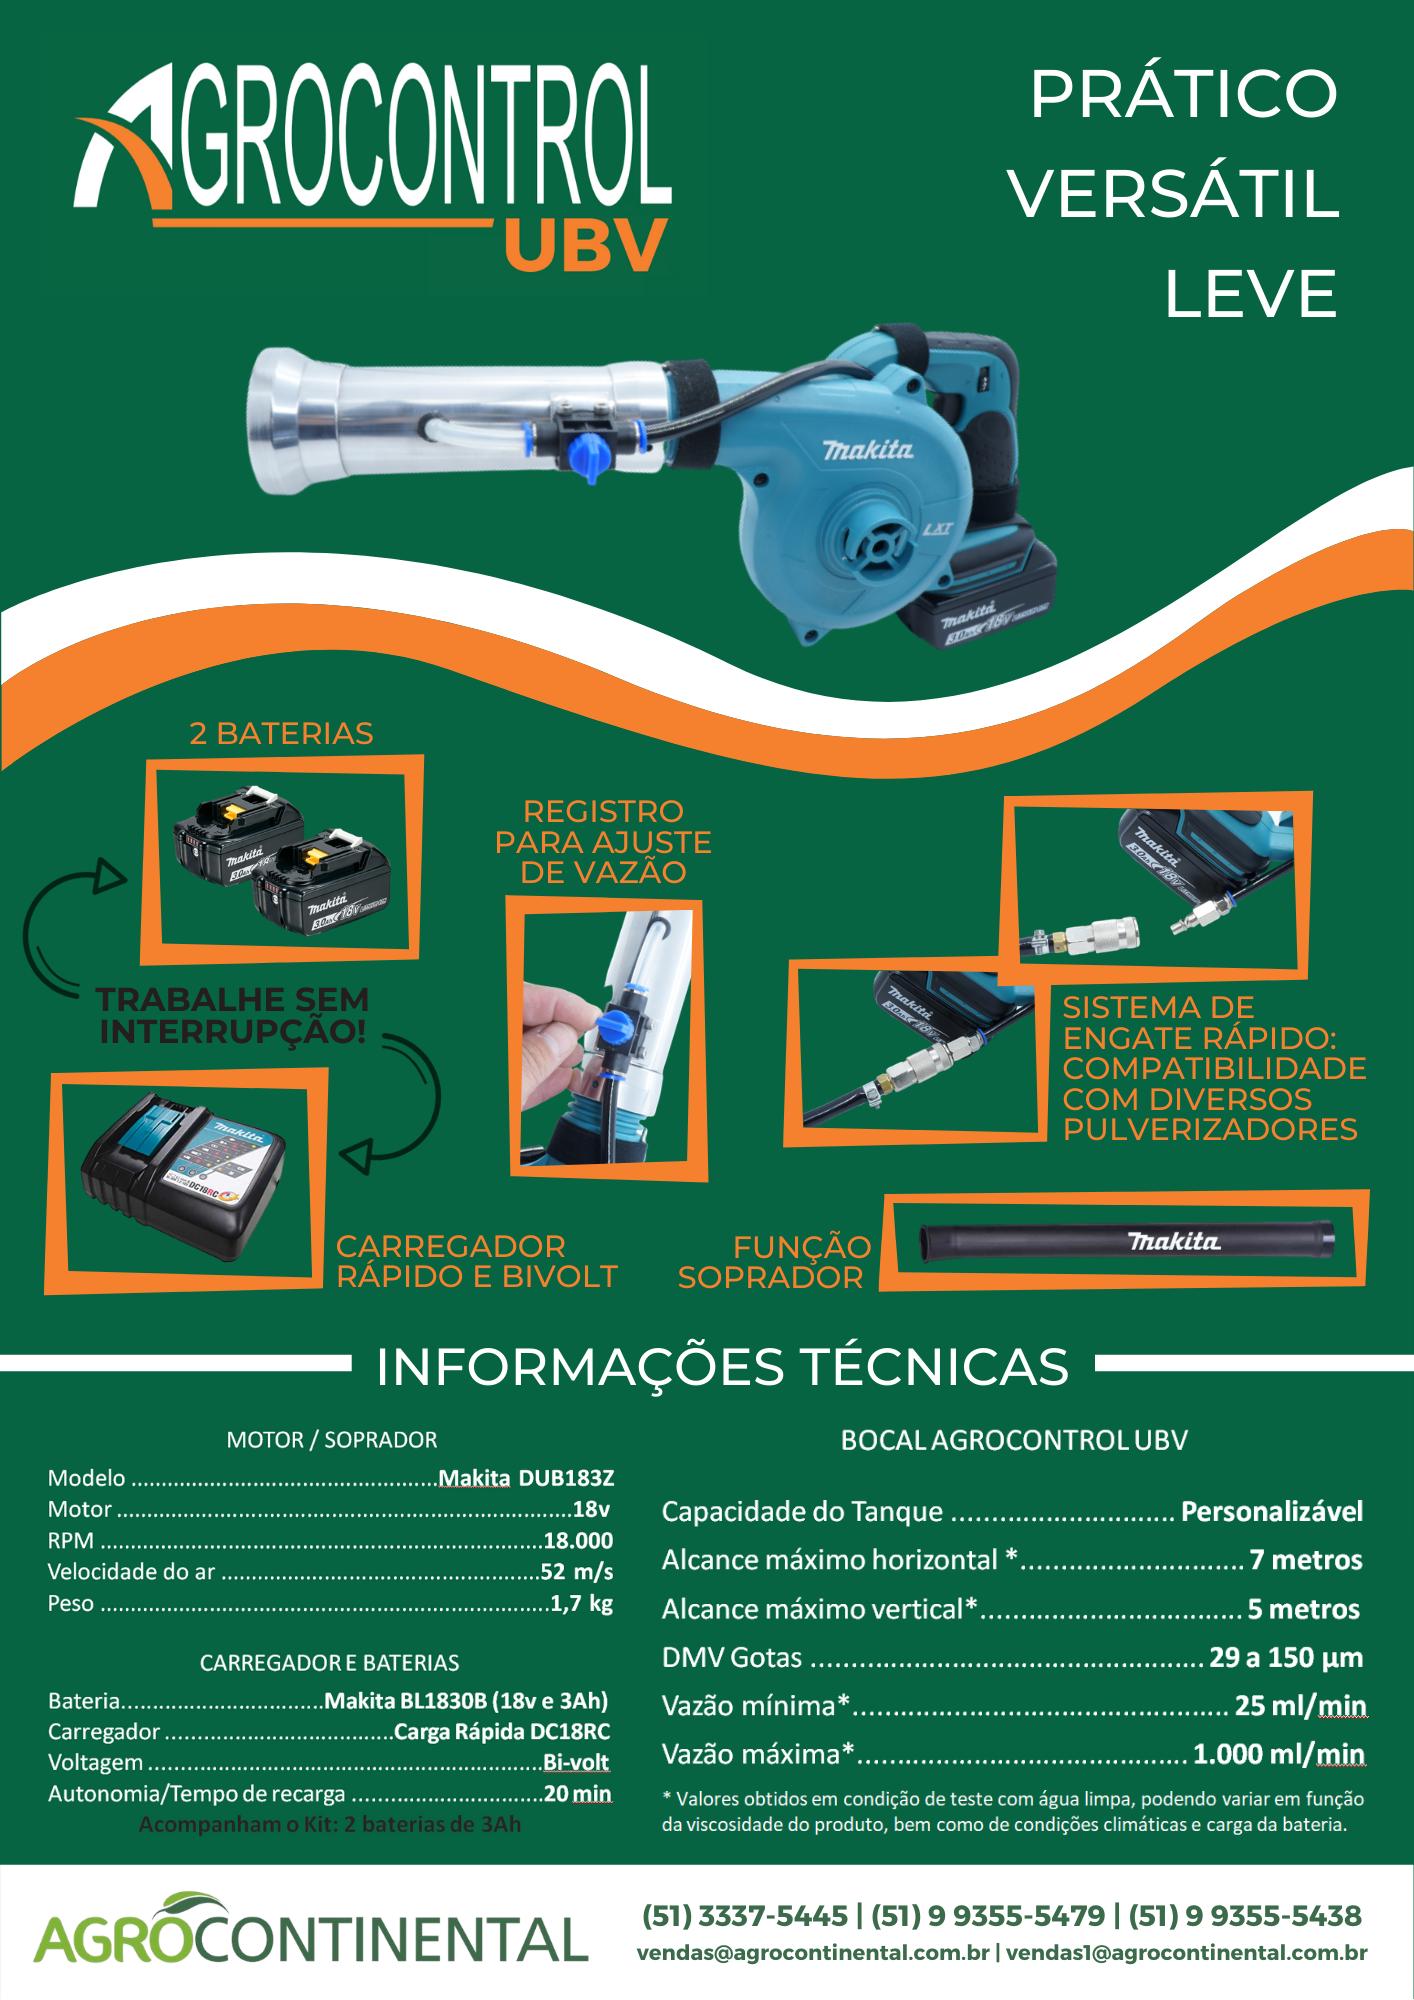 Ficha Técnica - Agrocontrol UBV